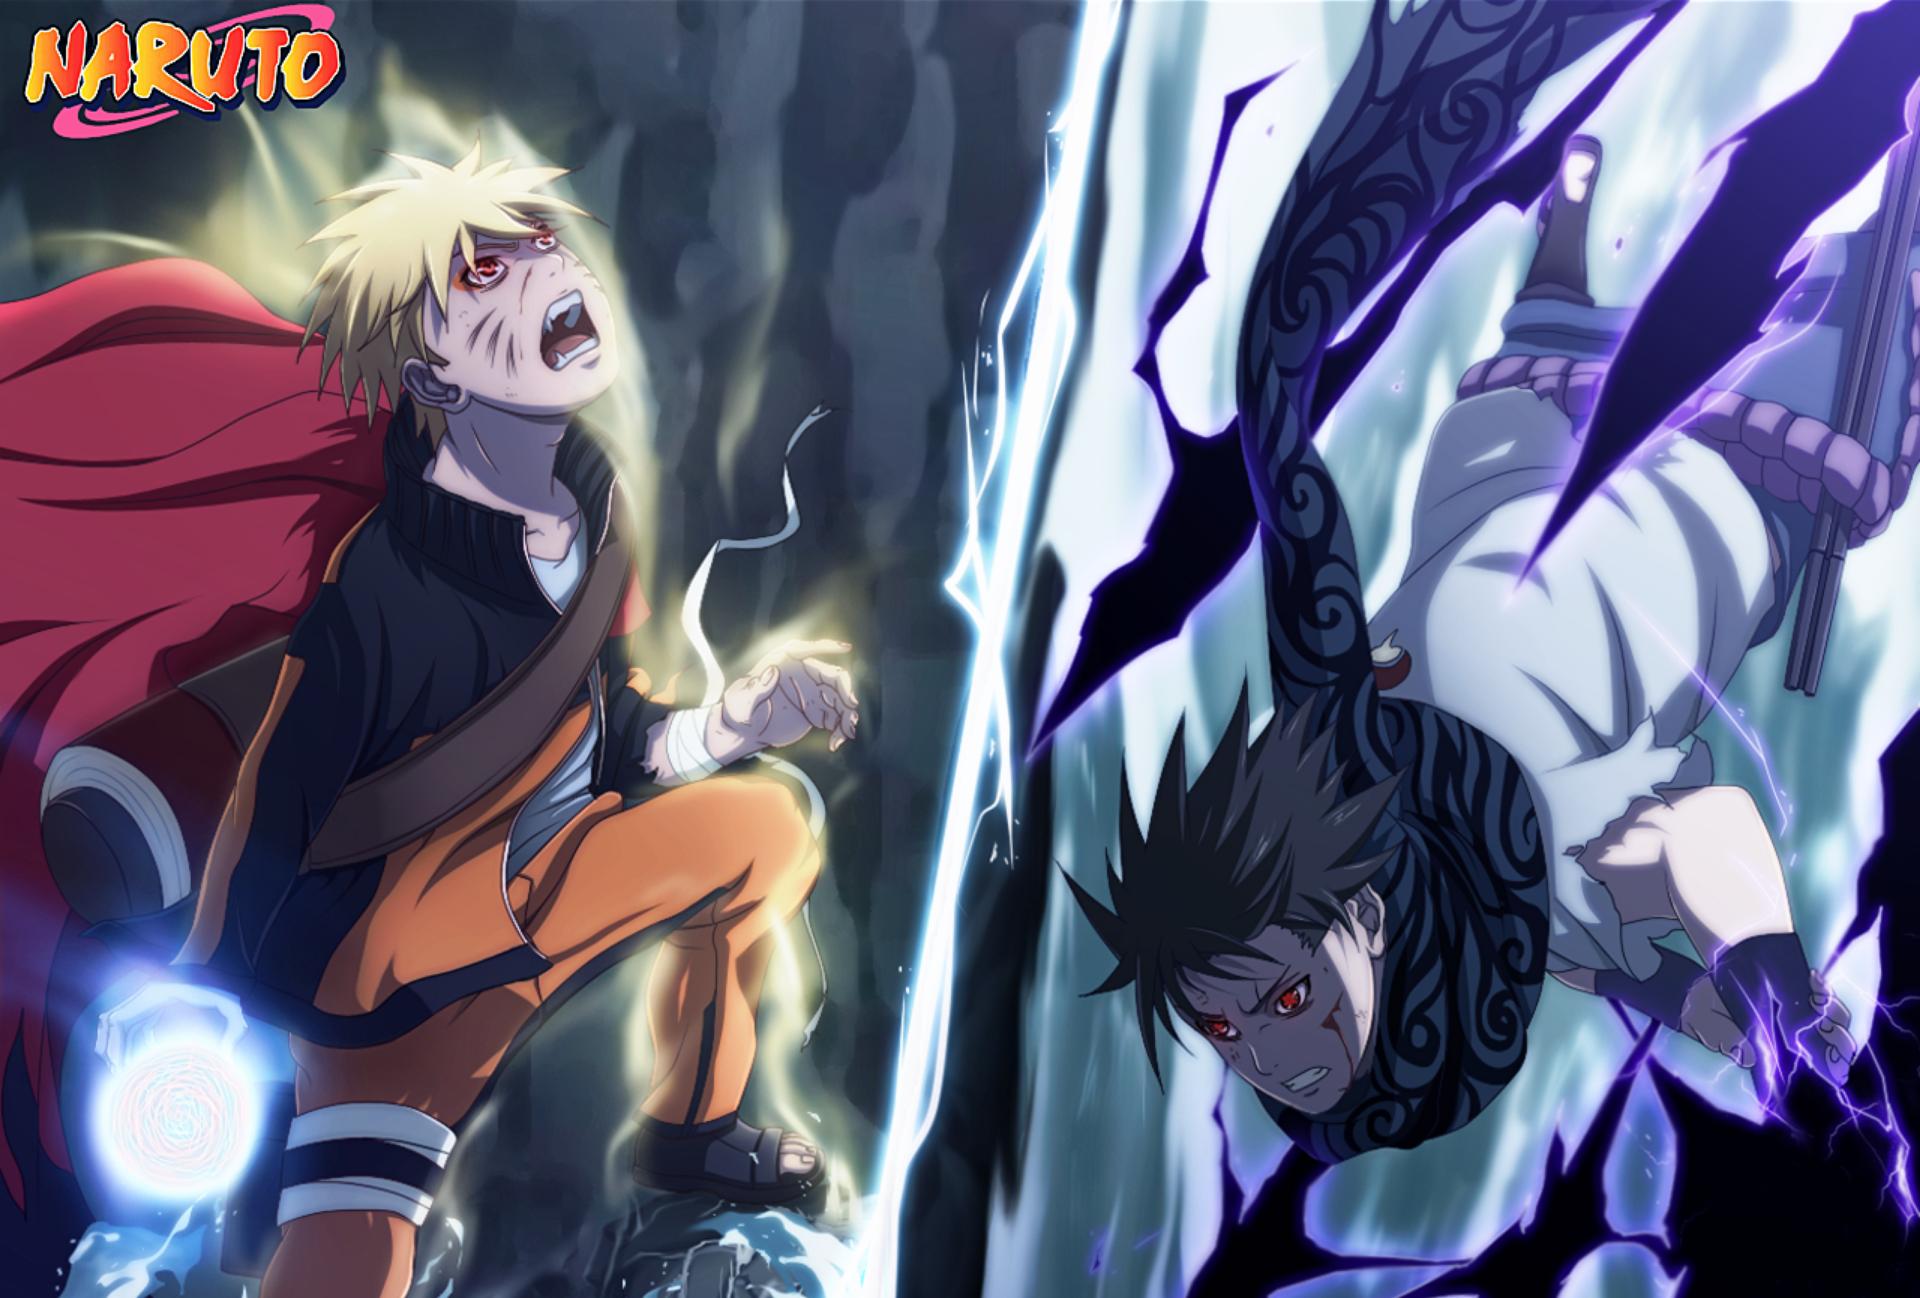 Naruto Fond d'écran HD   Arrière-Plan   1920x1298   ID:946265 - Wallpaper Abyss